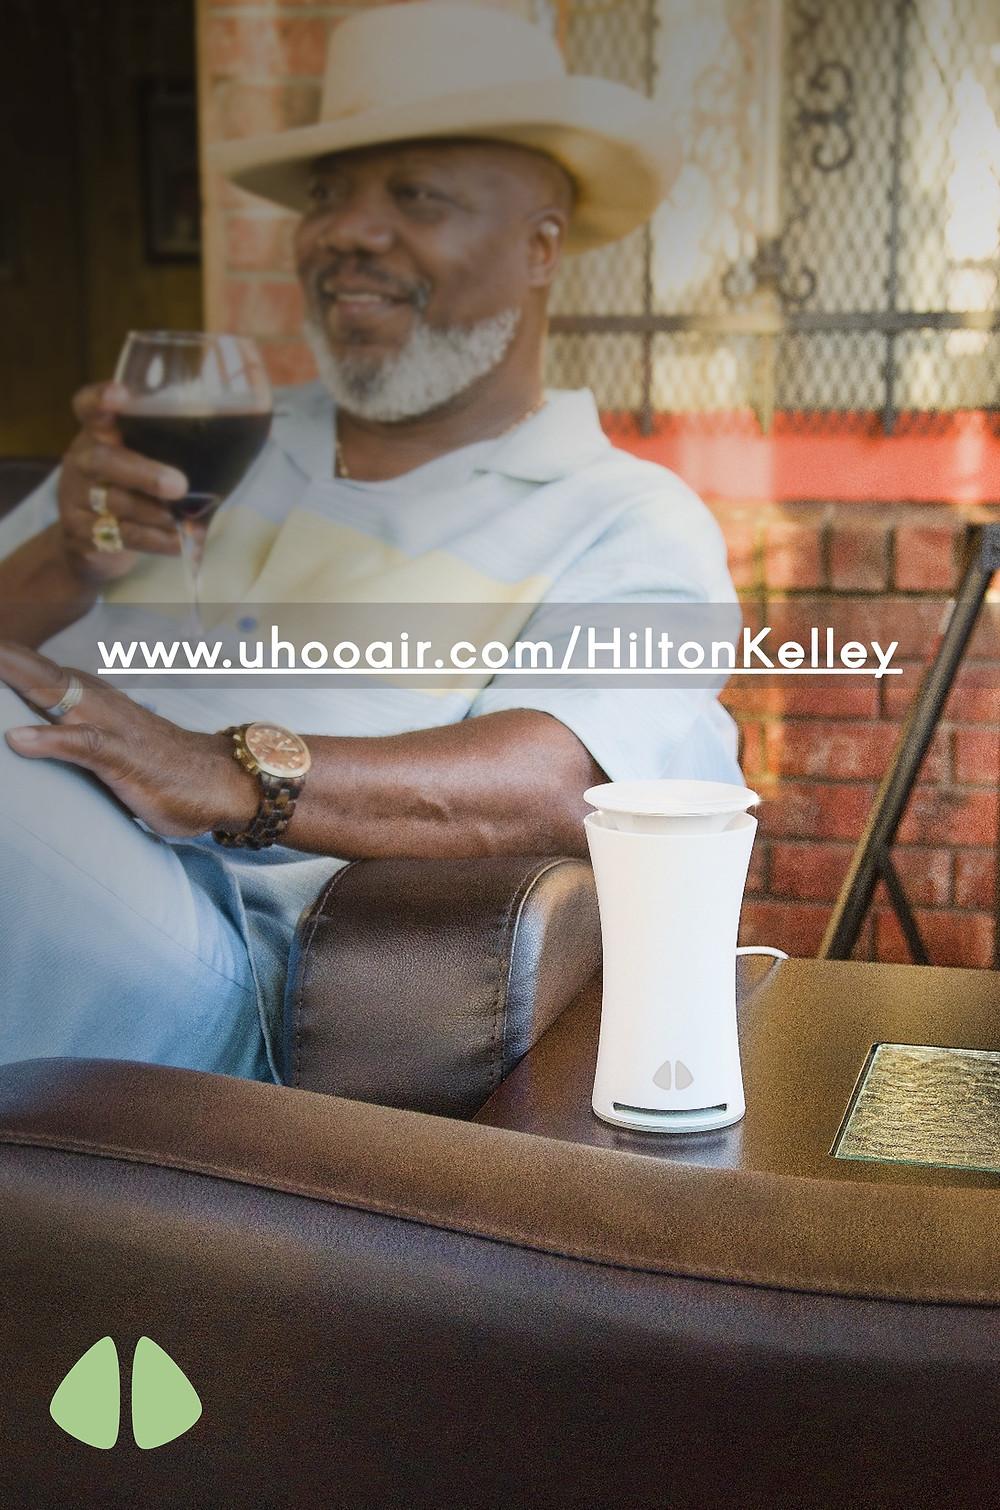 Hilton Kelley with the uHoo Air Toxin Sensor